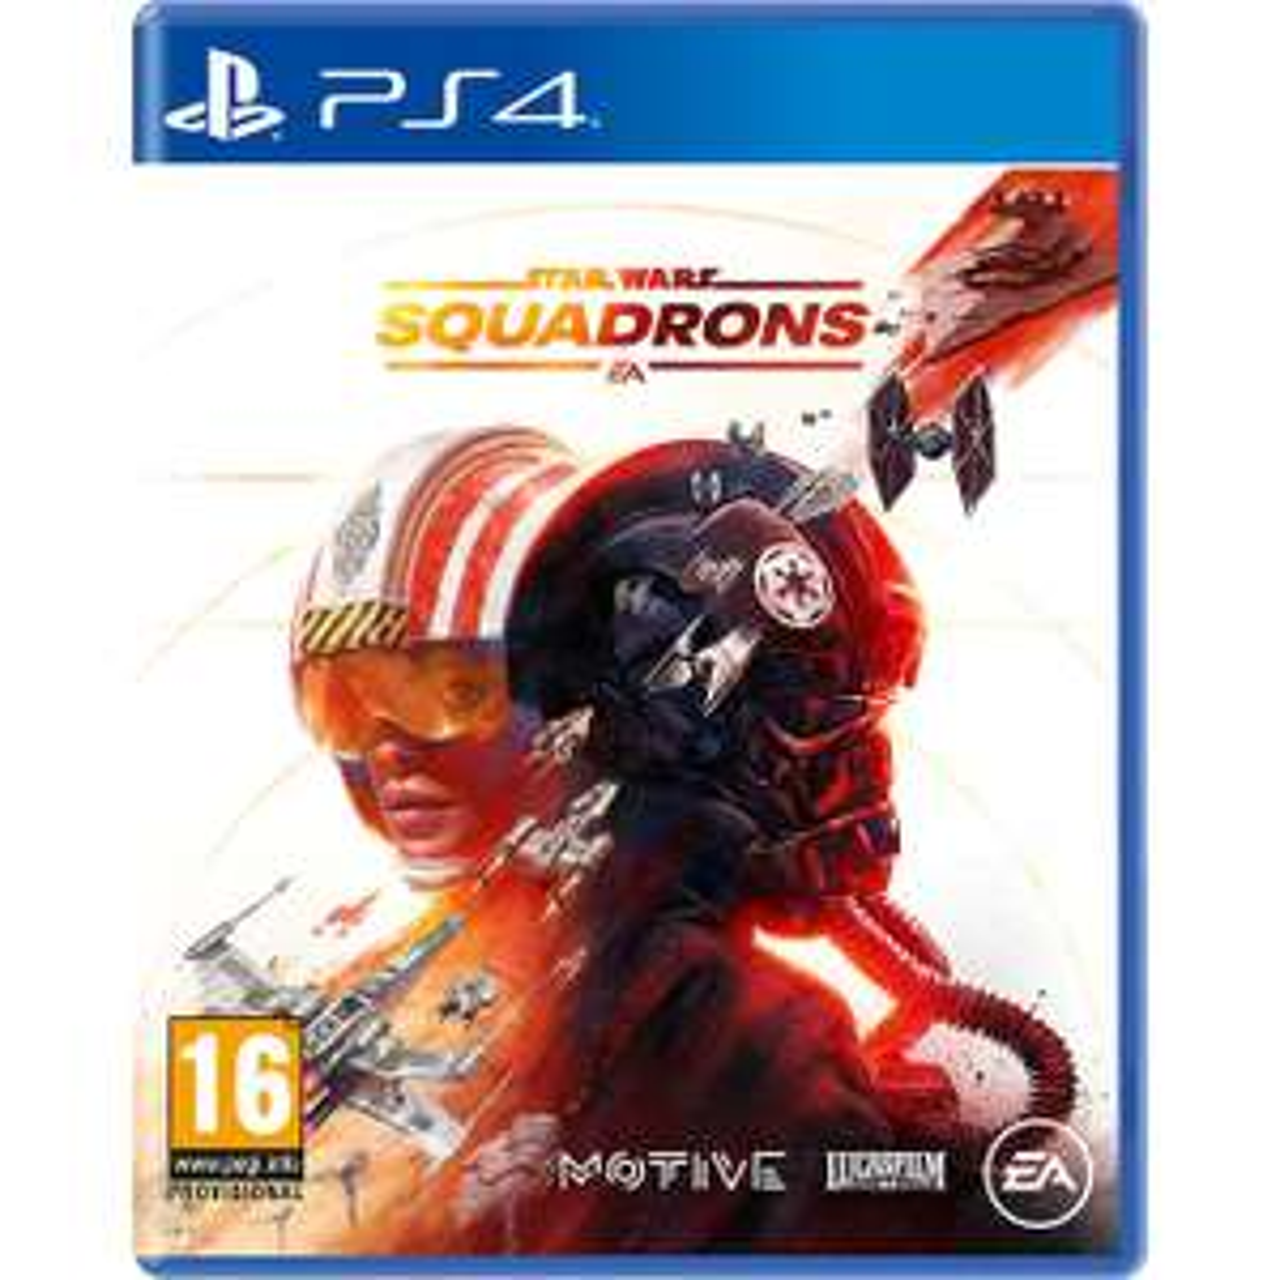 Star Wars: Squadrons (PS4) - £17.85 delivered @ Base